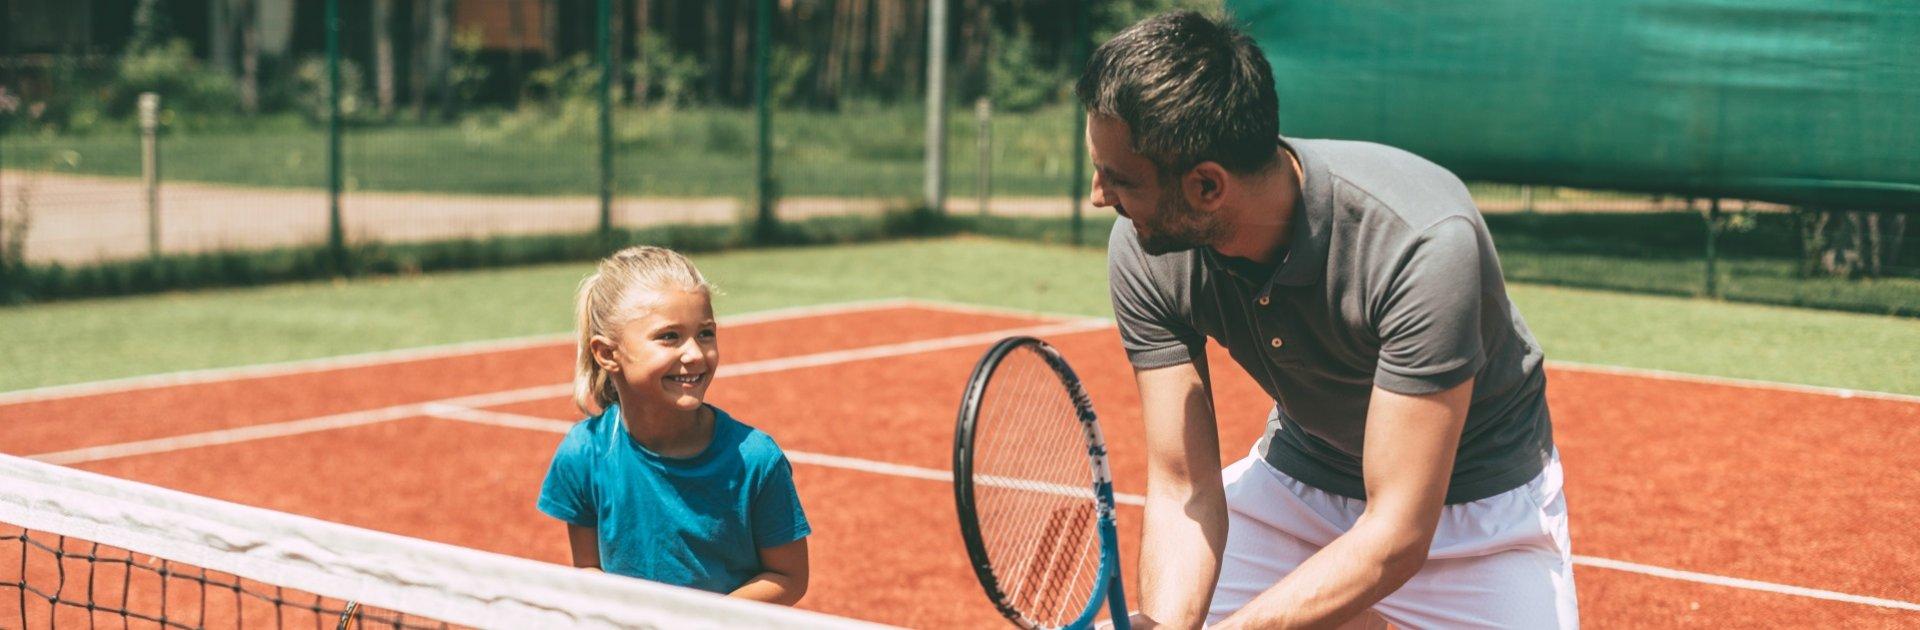 Tenniscamp im Familienurlaub